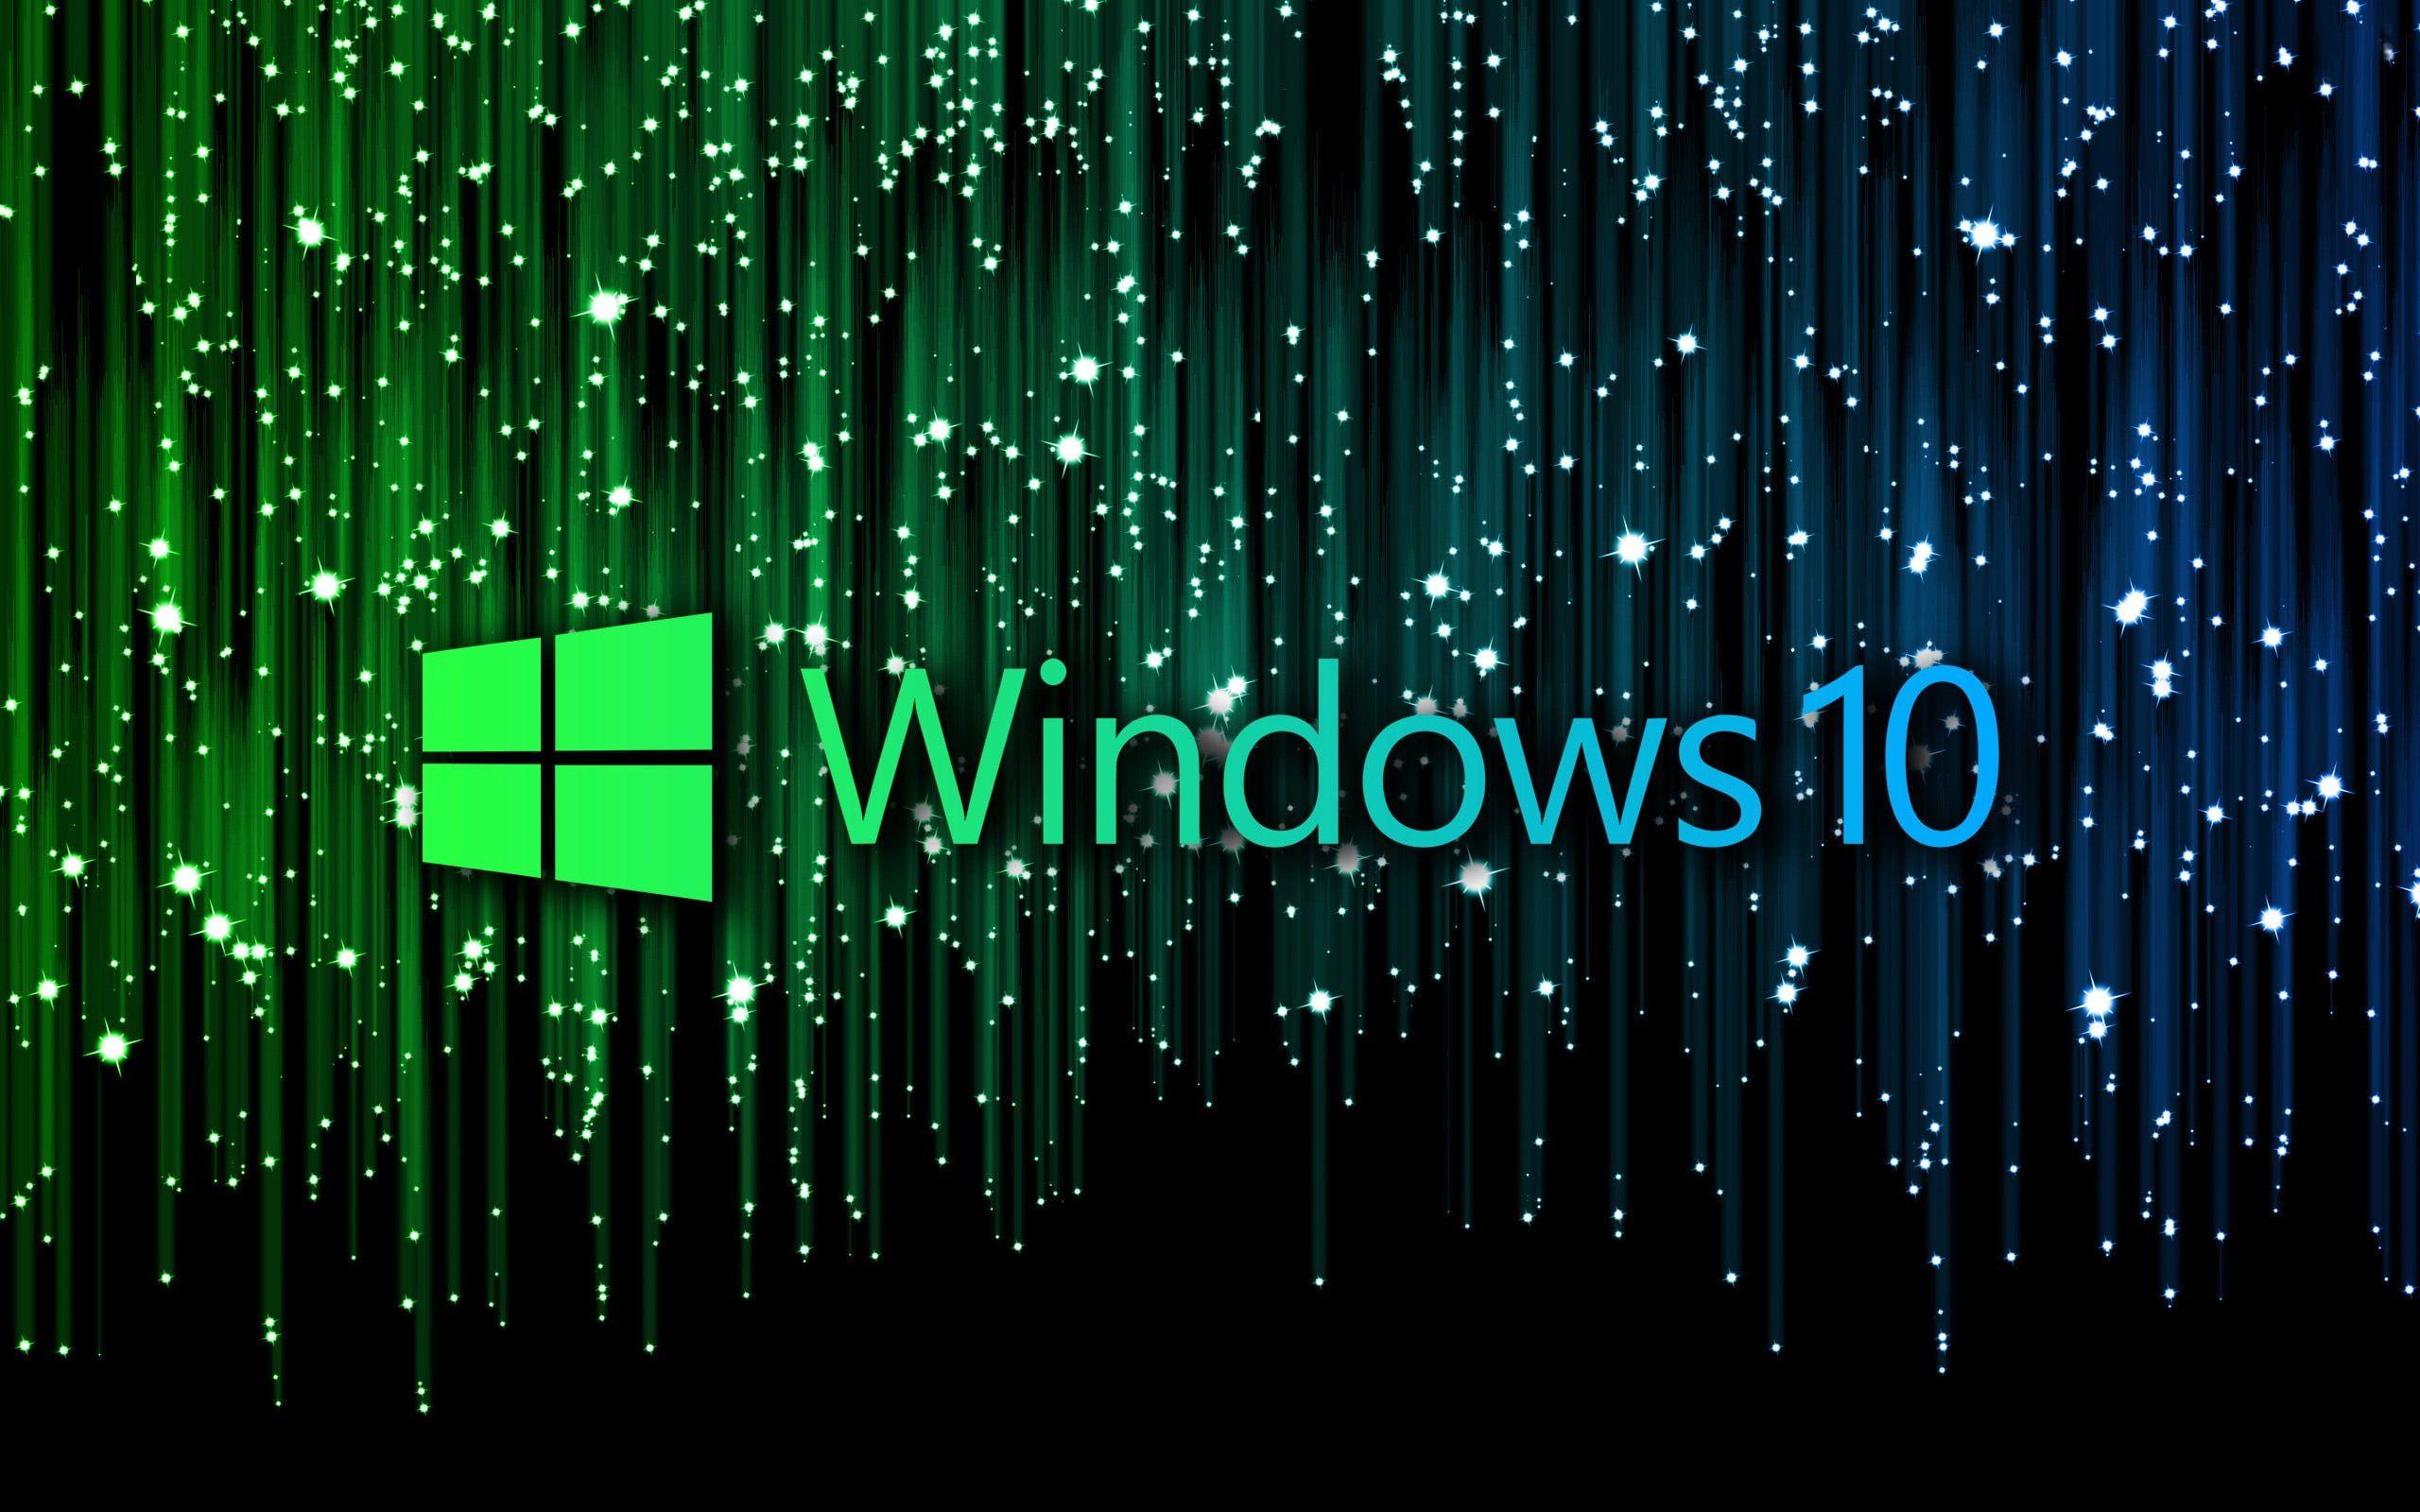 Windows 10 Hd Theme Desktop Wallpaper 11 Windows 10 Digital Wallpaper 2k Wallpaper Hdwallpaper Desktop Windows 10 Wallpaper Windows 10 Desktop Wallpaper